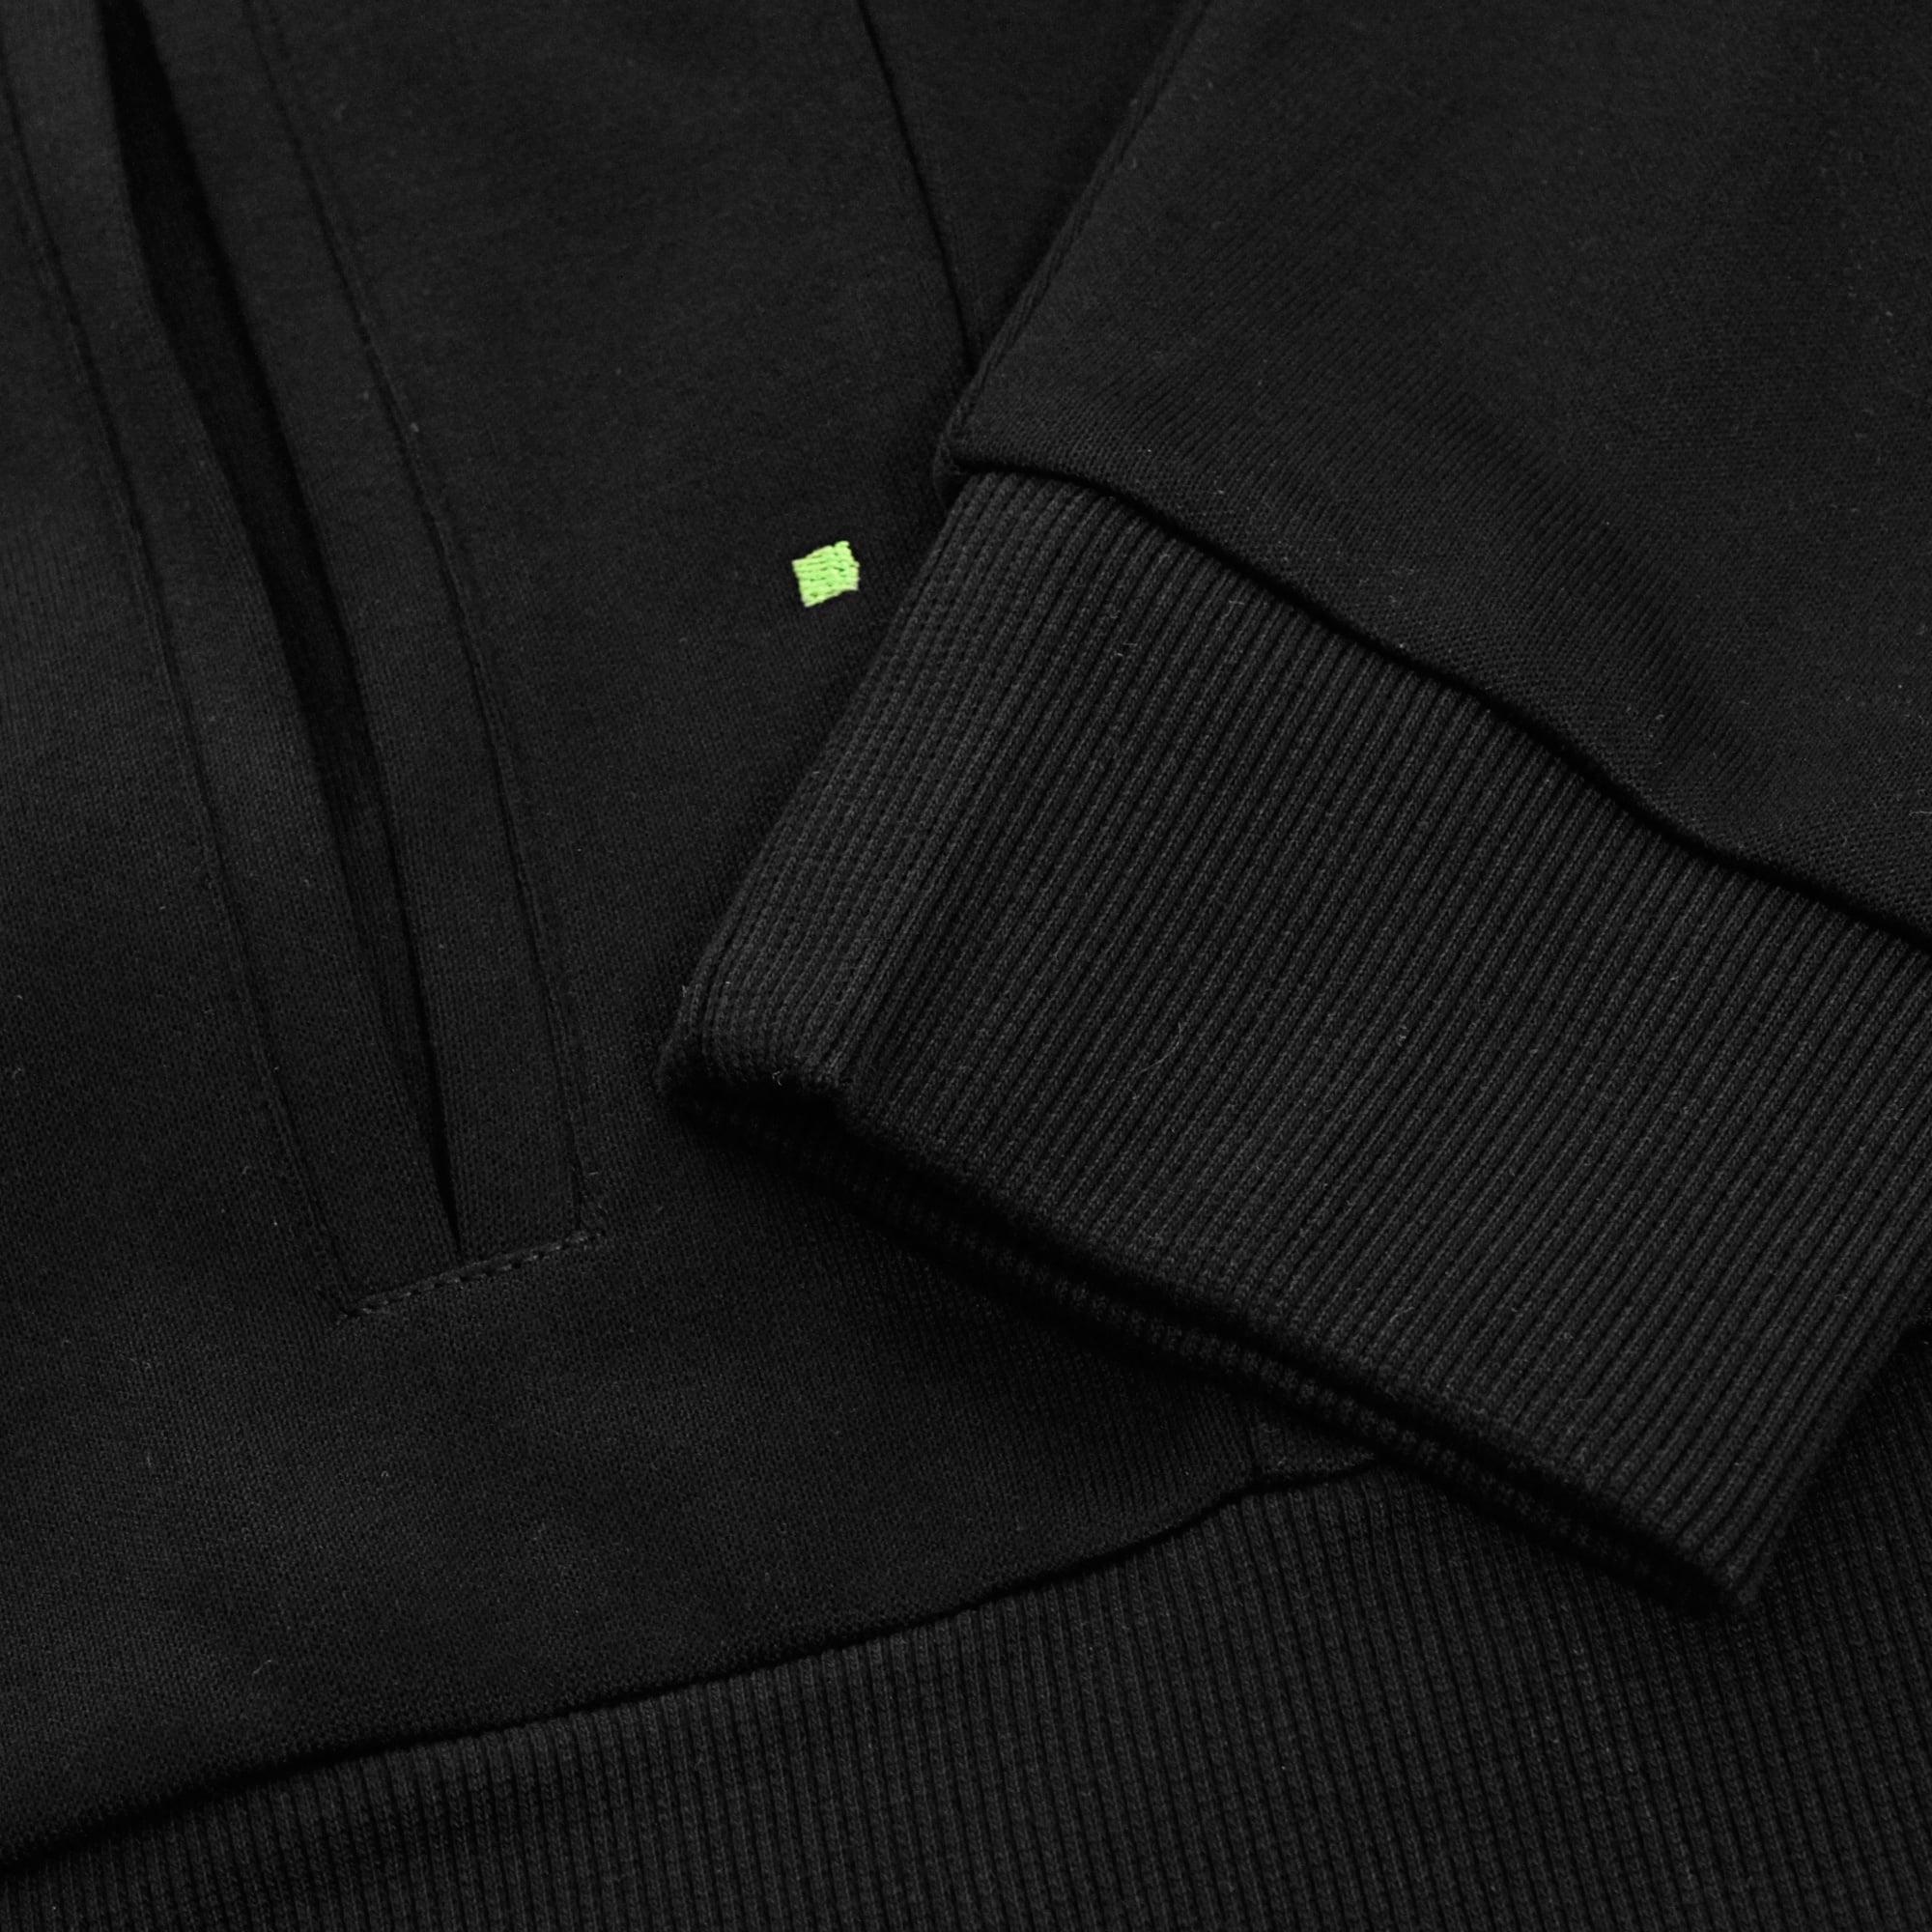 5fc075a94a6 Lyst - BOSS Green Hugo Boss Skaz Black Track Top 50324768 in Black ...